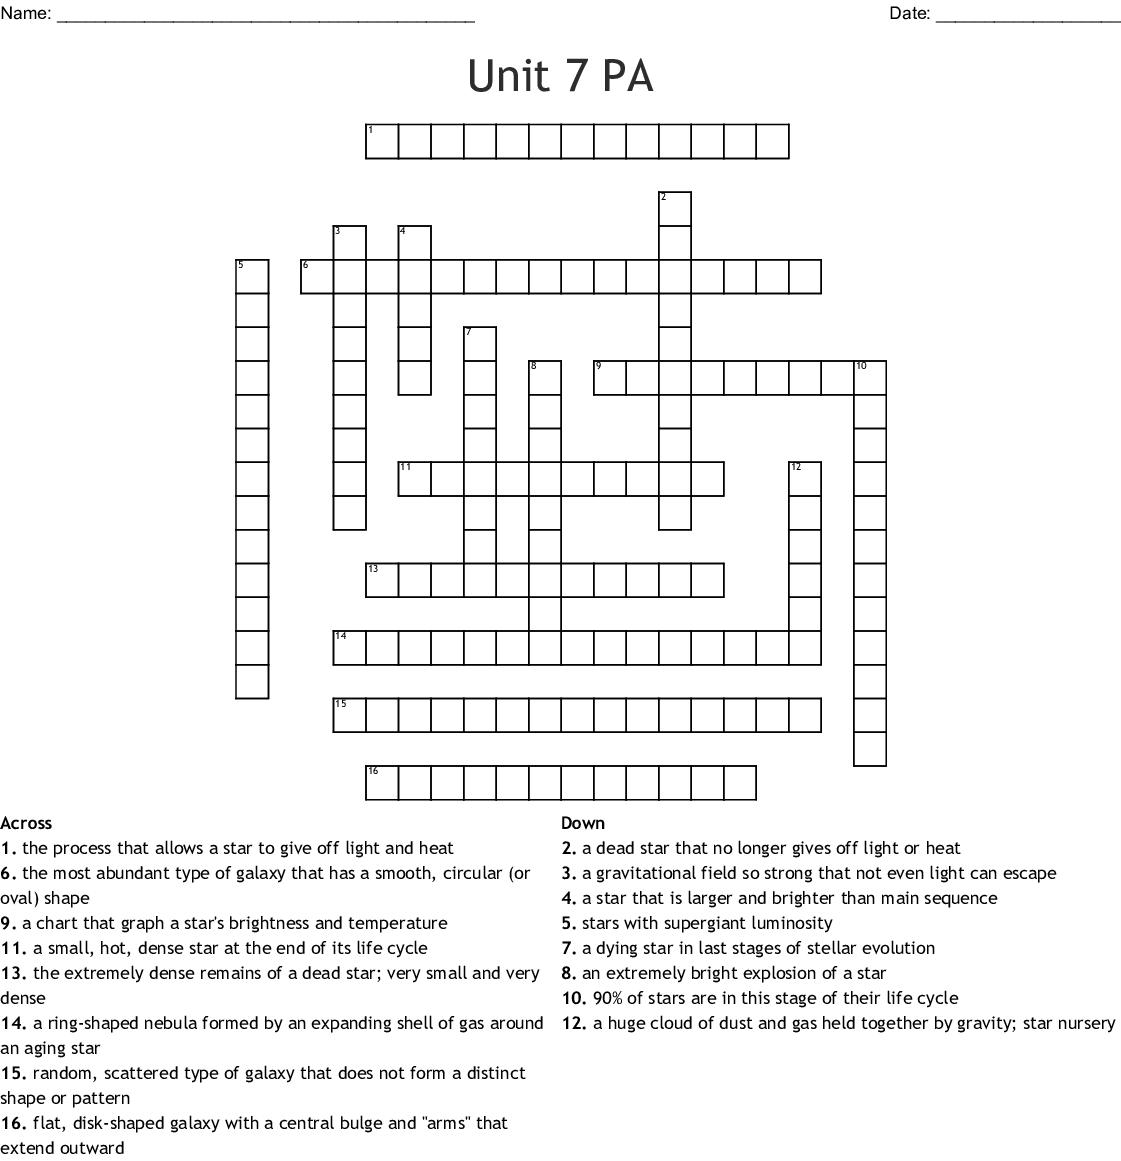 Unit 7 Pa Crossword